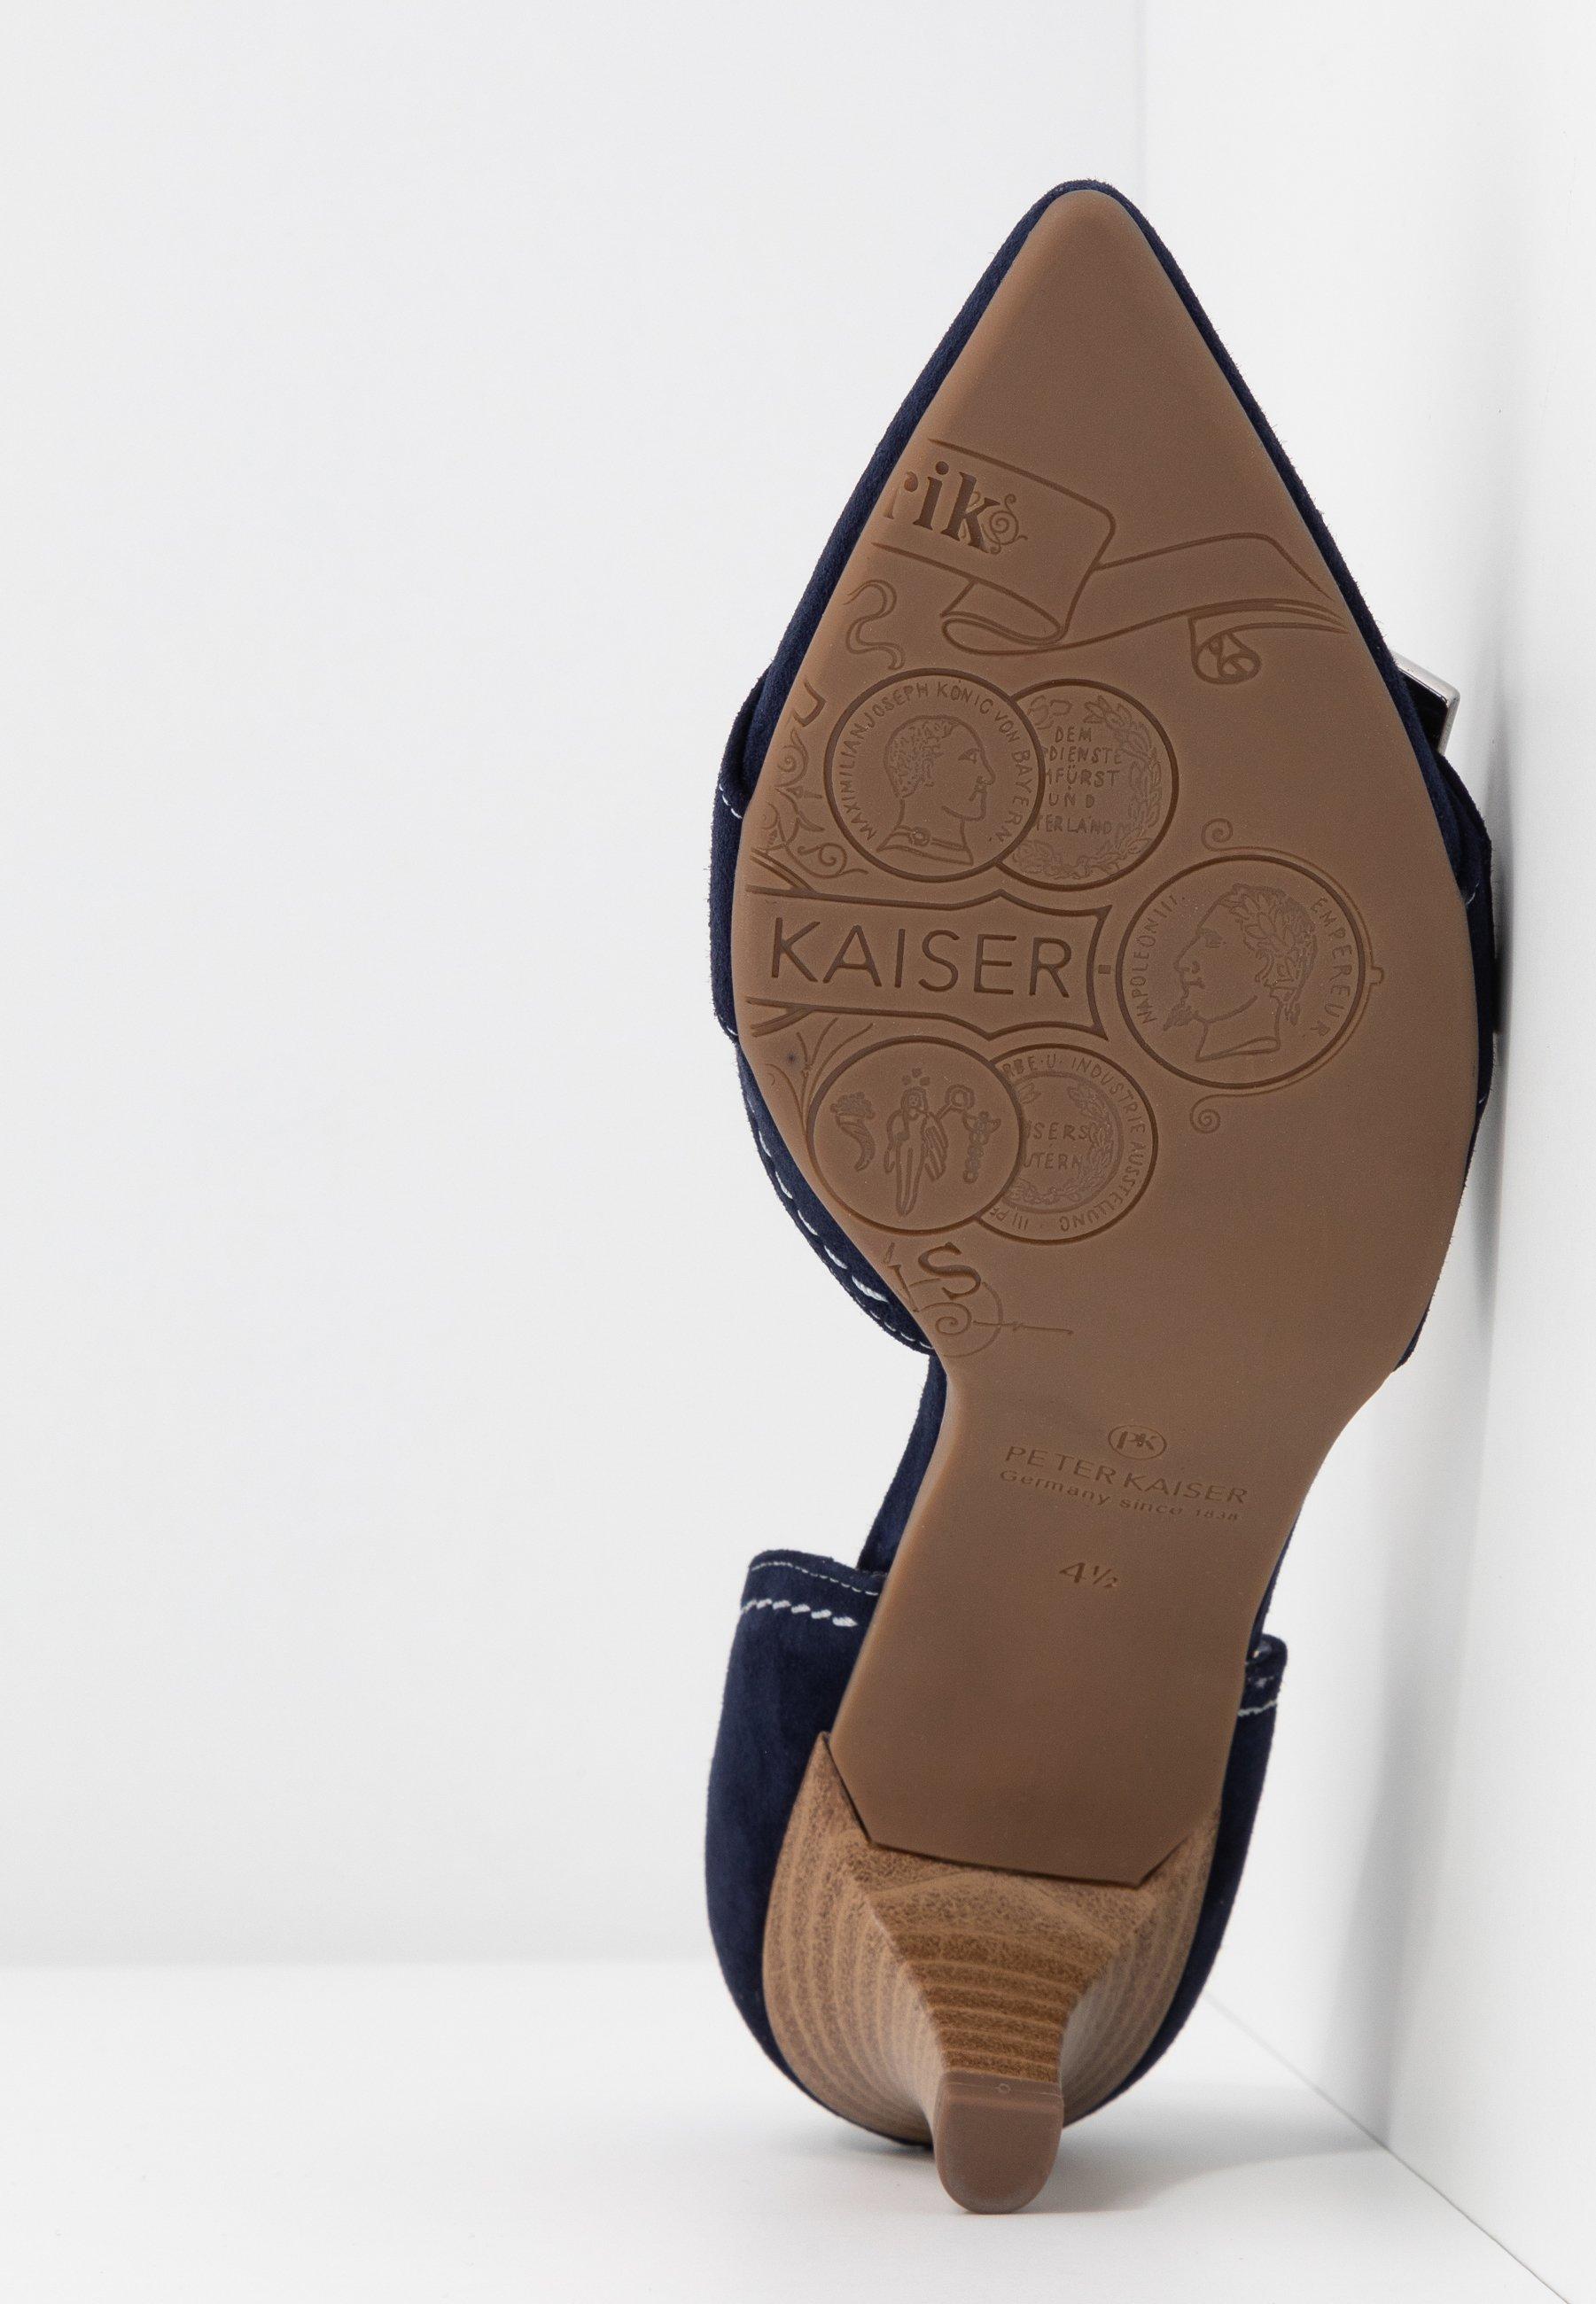 Peter Kaiser BIANKA - Escarpins - notte - Chaussures à talons femme Qualité